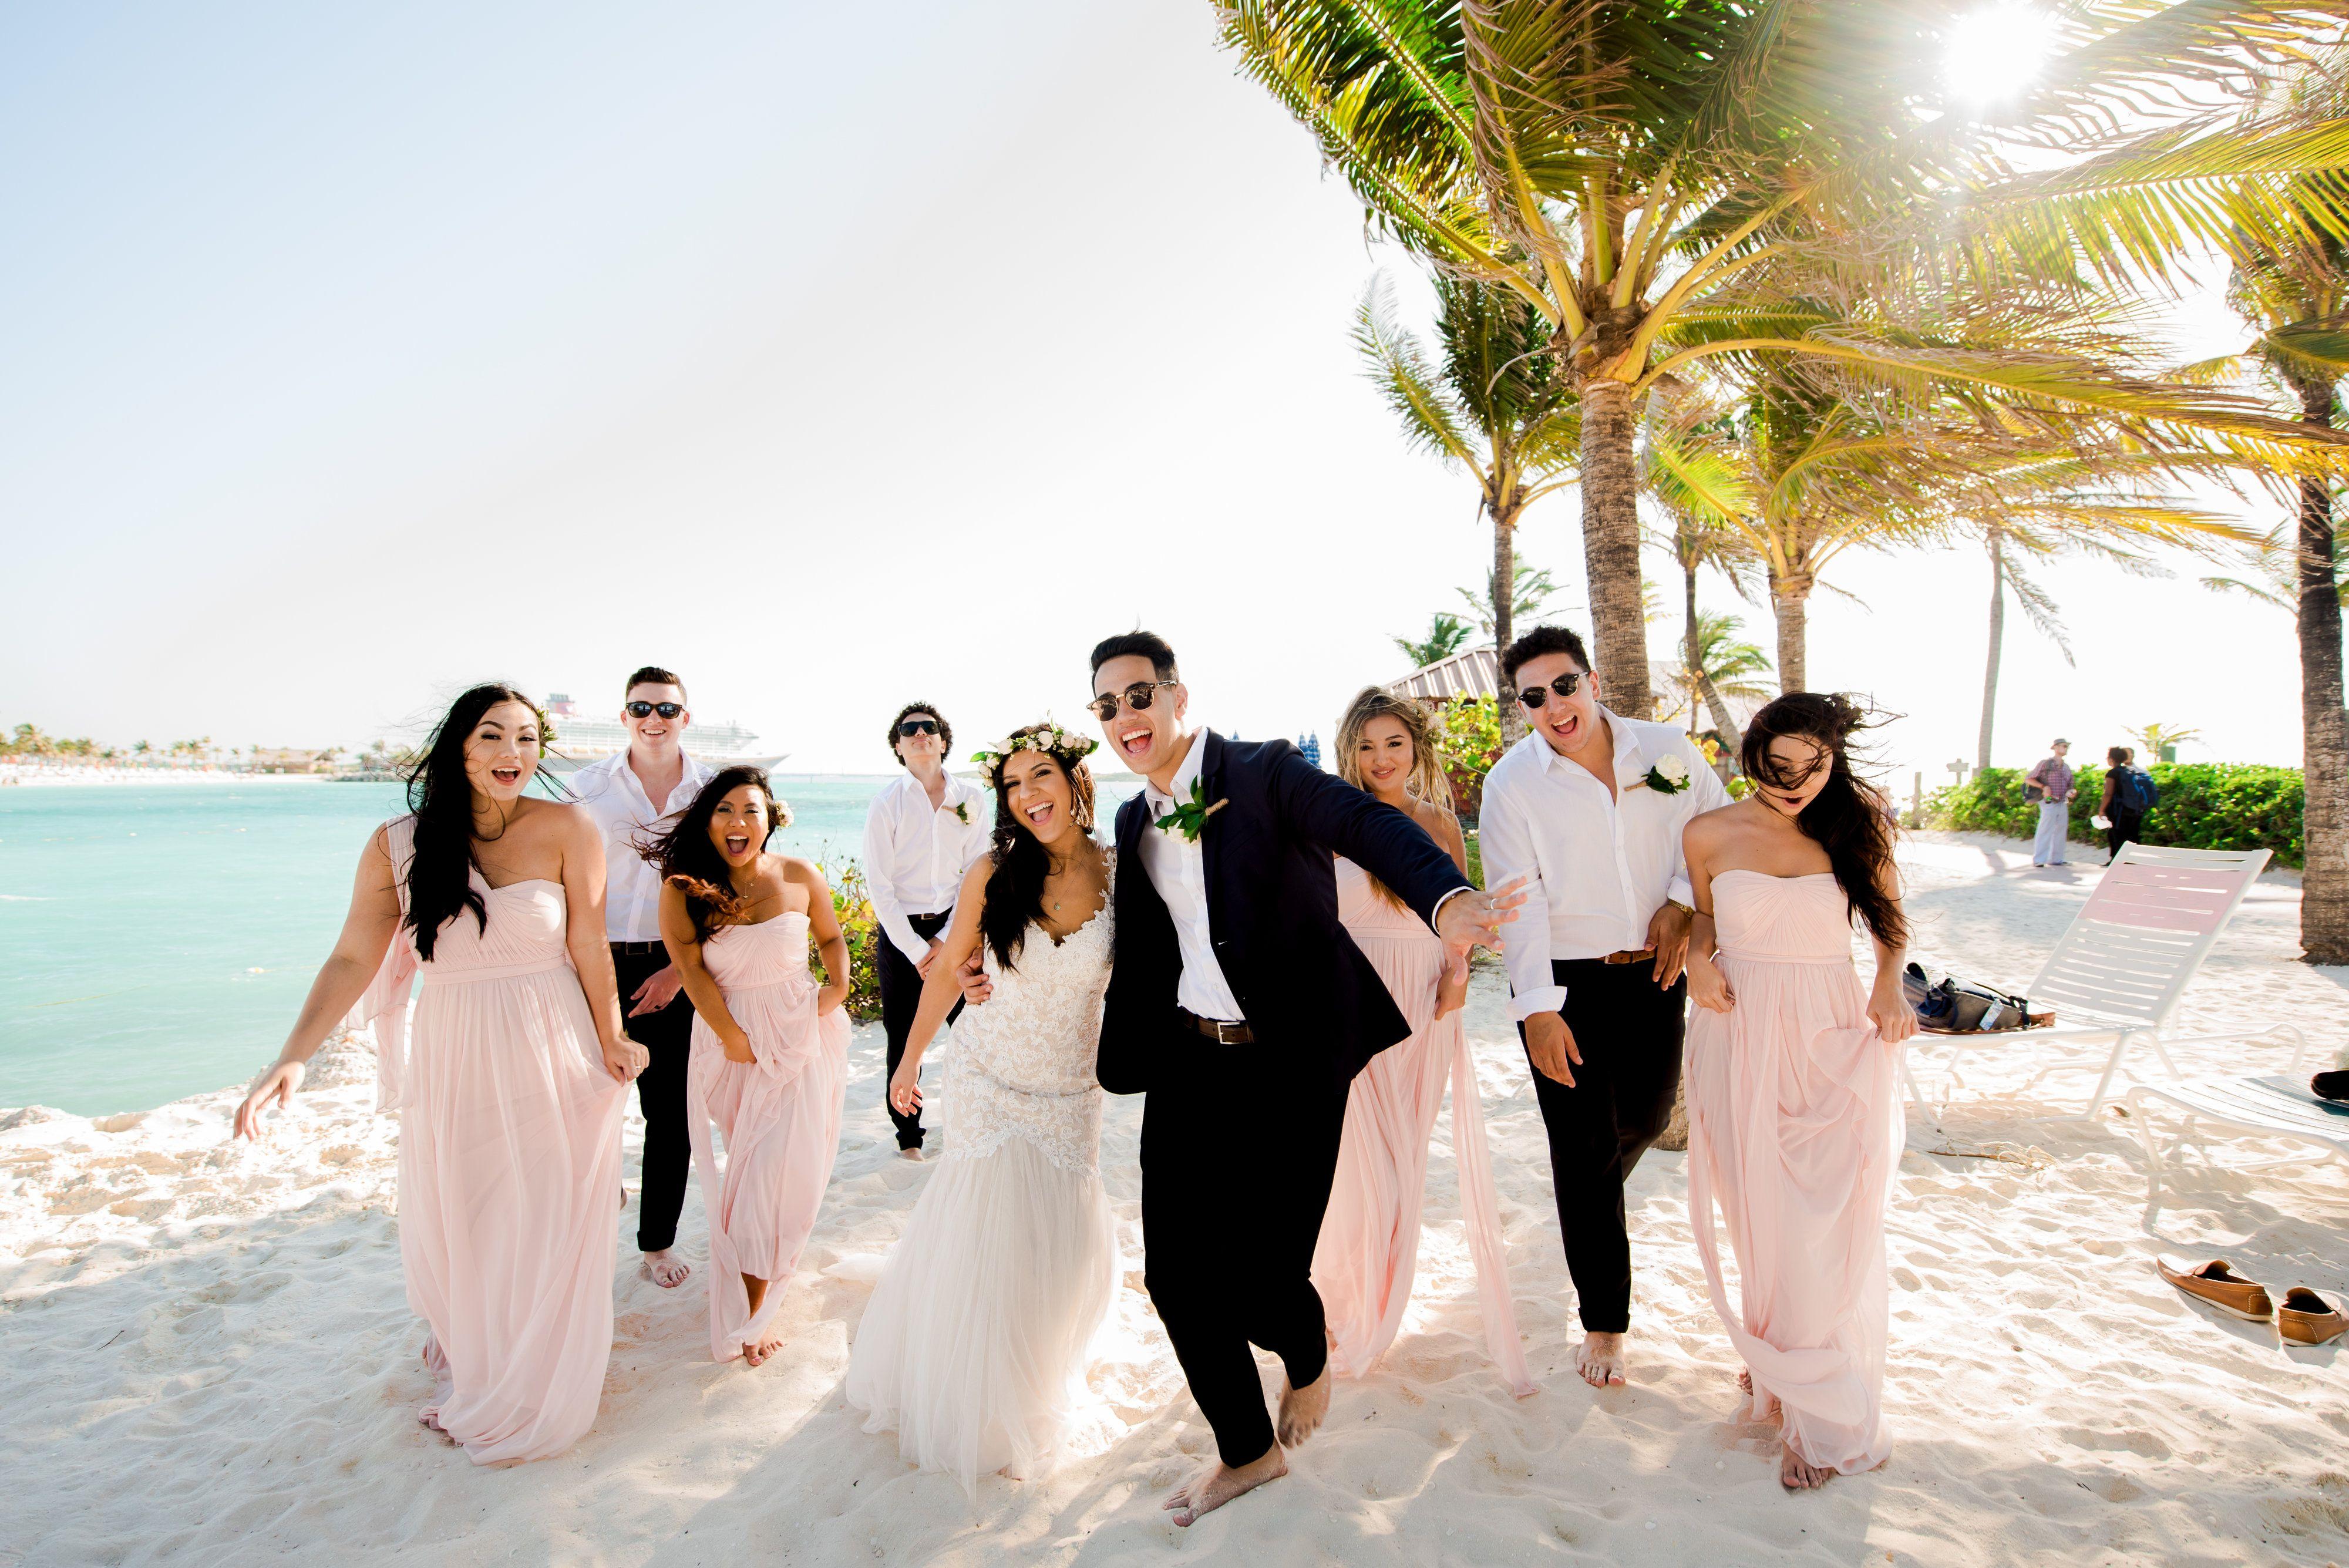 Disney Cruise Wedding.Disney Cruise Line Wedding Disney Wedding Bridal Party Real